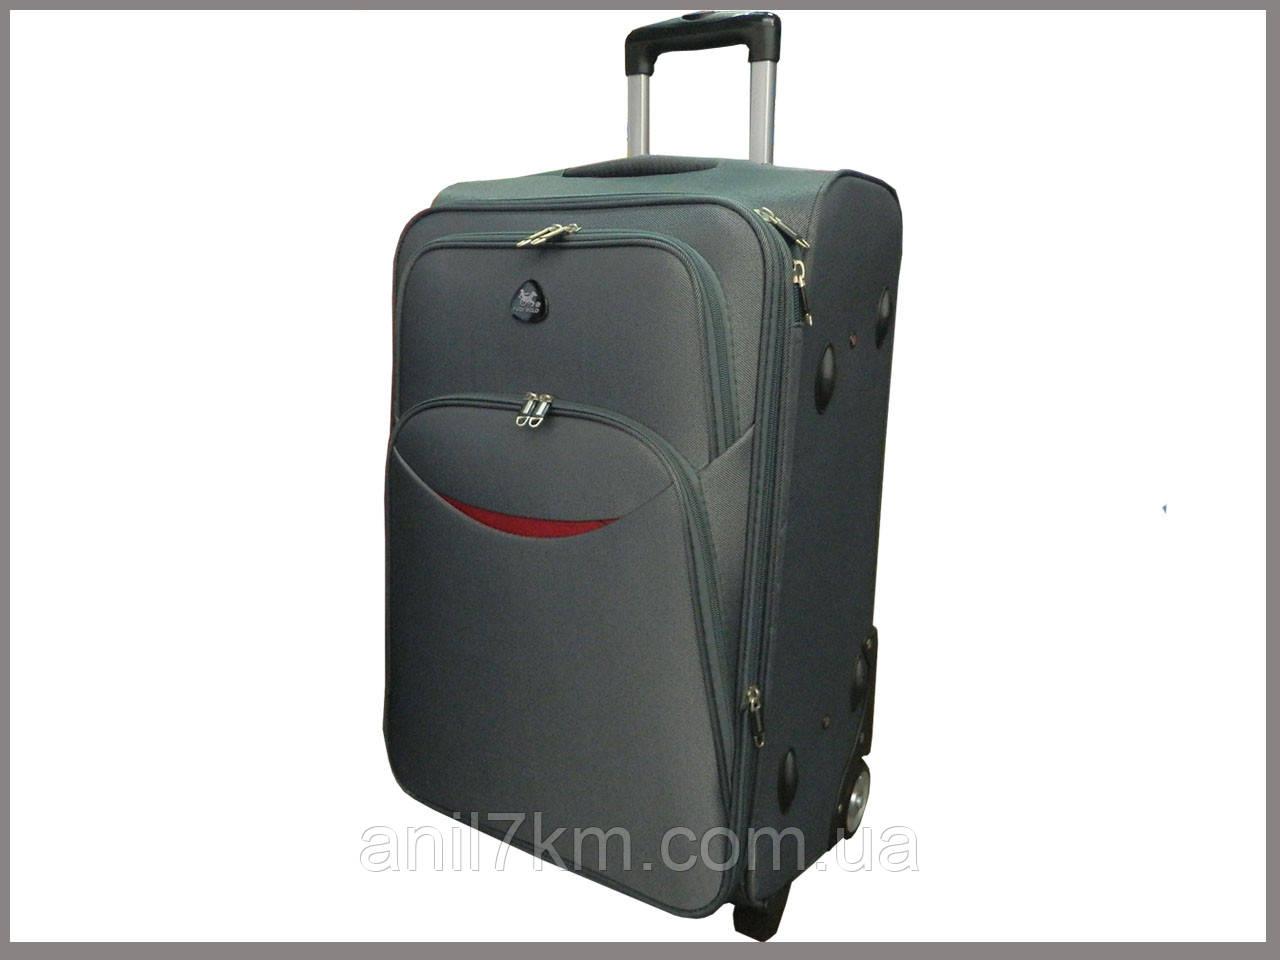 Большой дорожный чемодан на колёсах